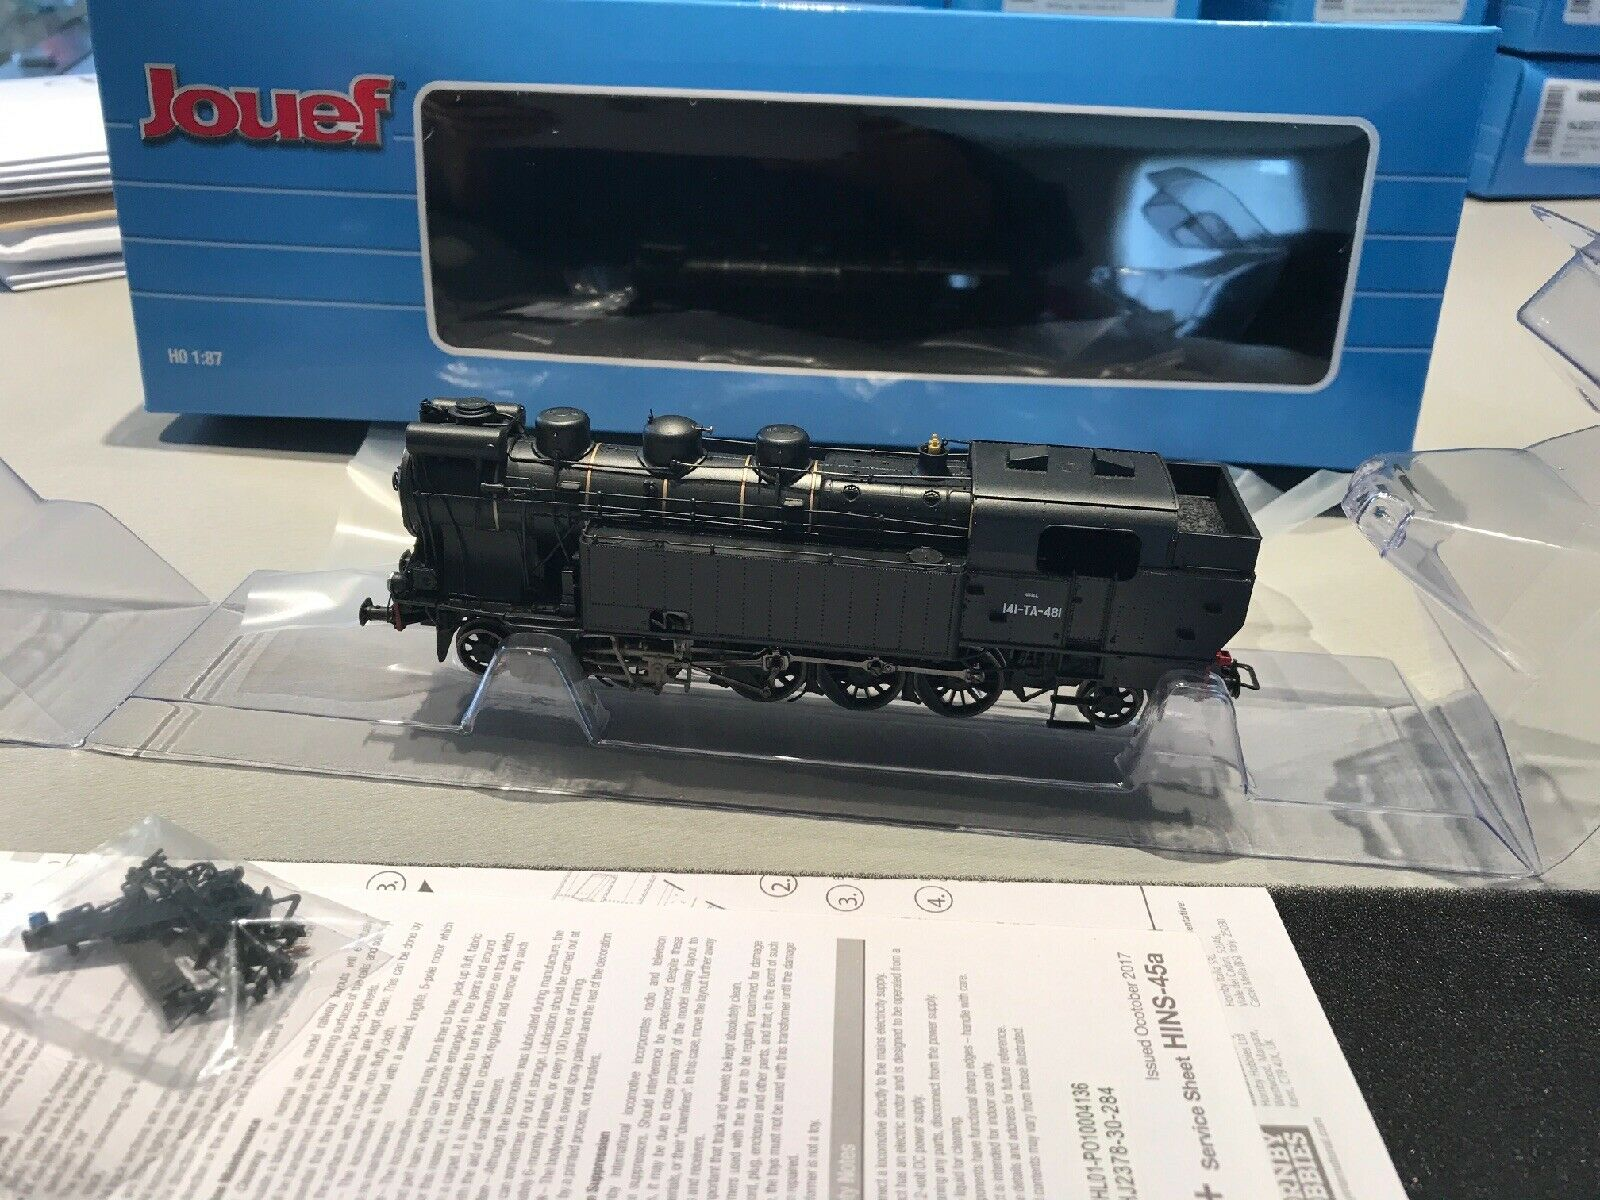 JOUEF HJ2378 LOCOMOTIVE VAPEUR SNCF 141 TA 481 LIVRÉE neroE ACFI NEUVE EN BOÎTE